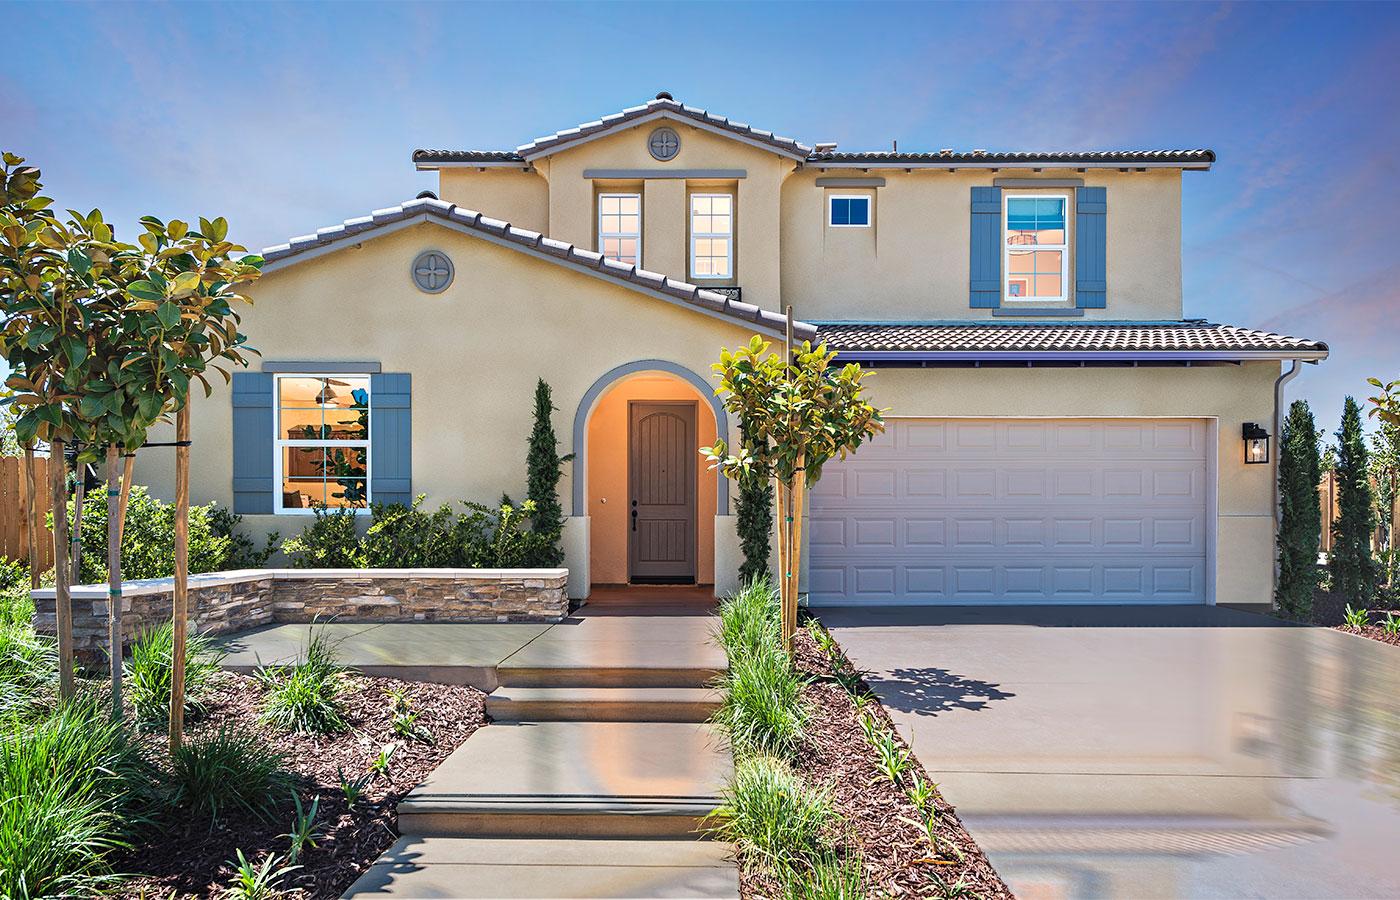 New-Homes-Clovis-large-lots